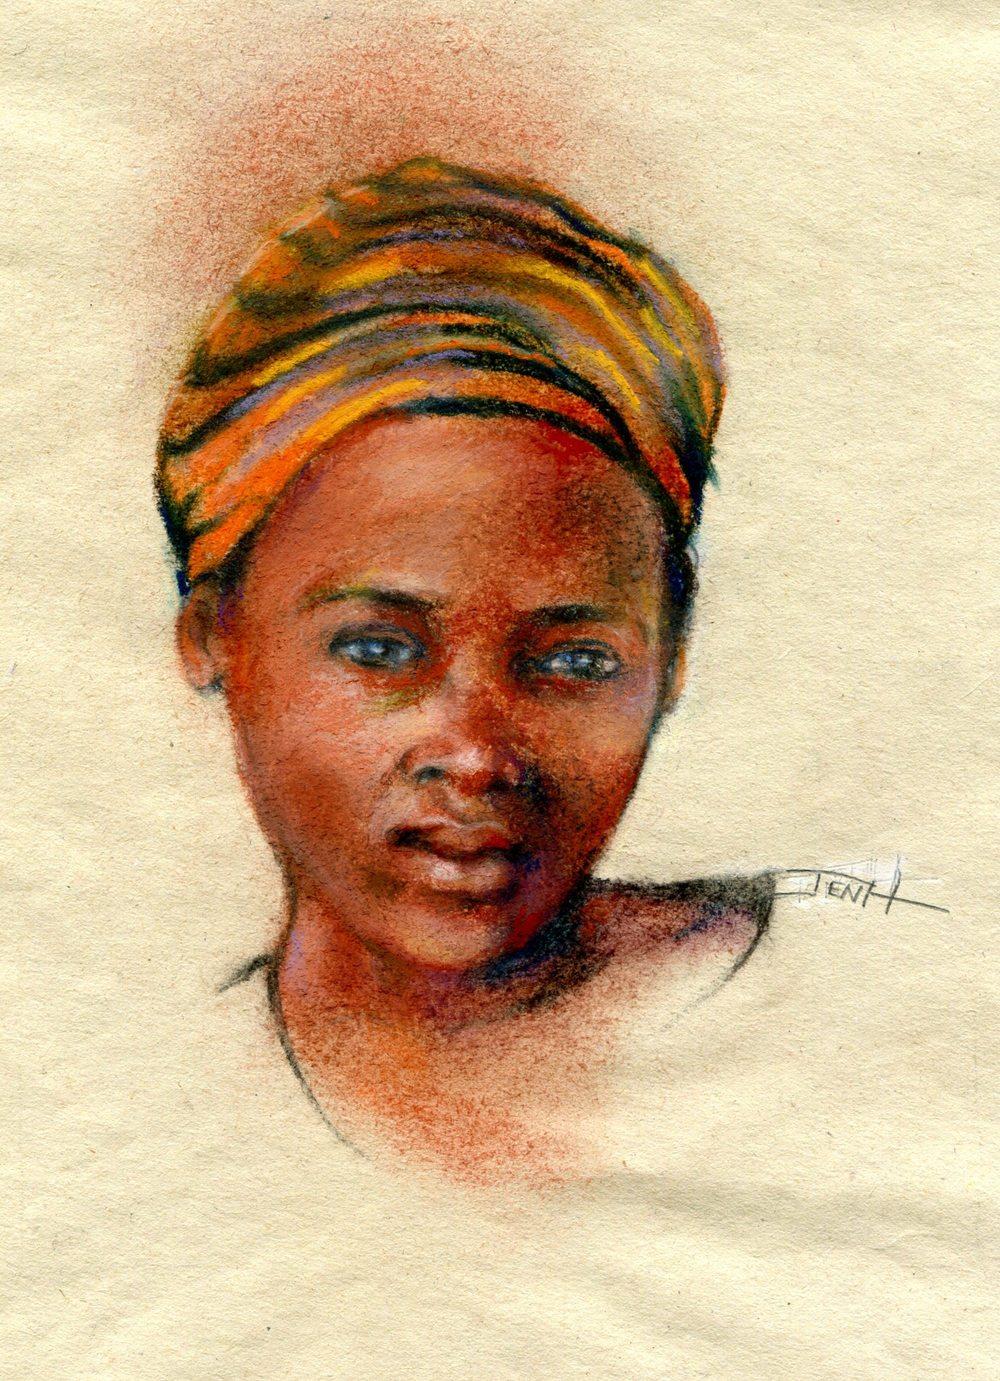 Hallowes, Jenny 37b Born in SA - Londeka, Pastel on sugar paper.